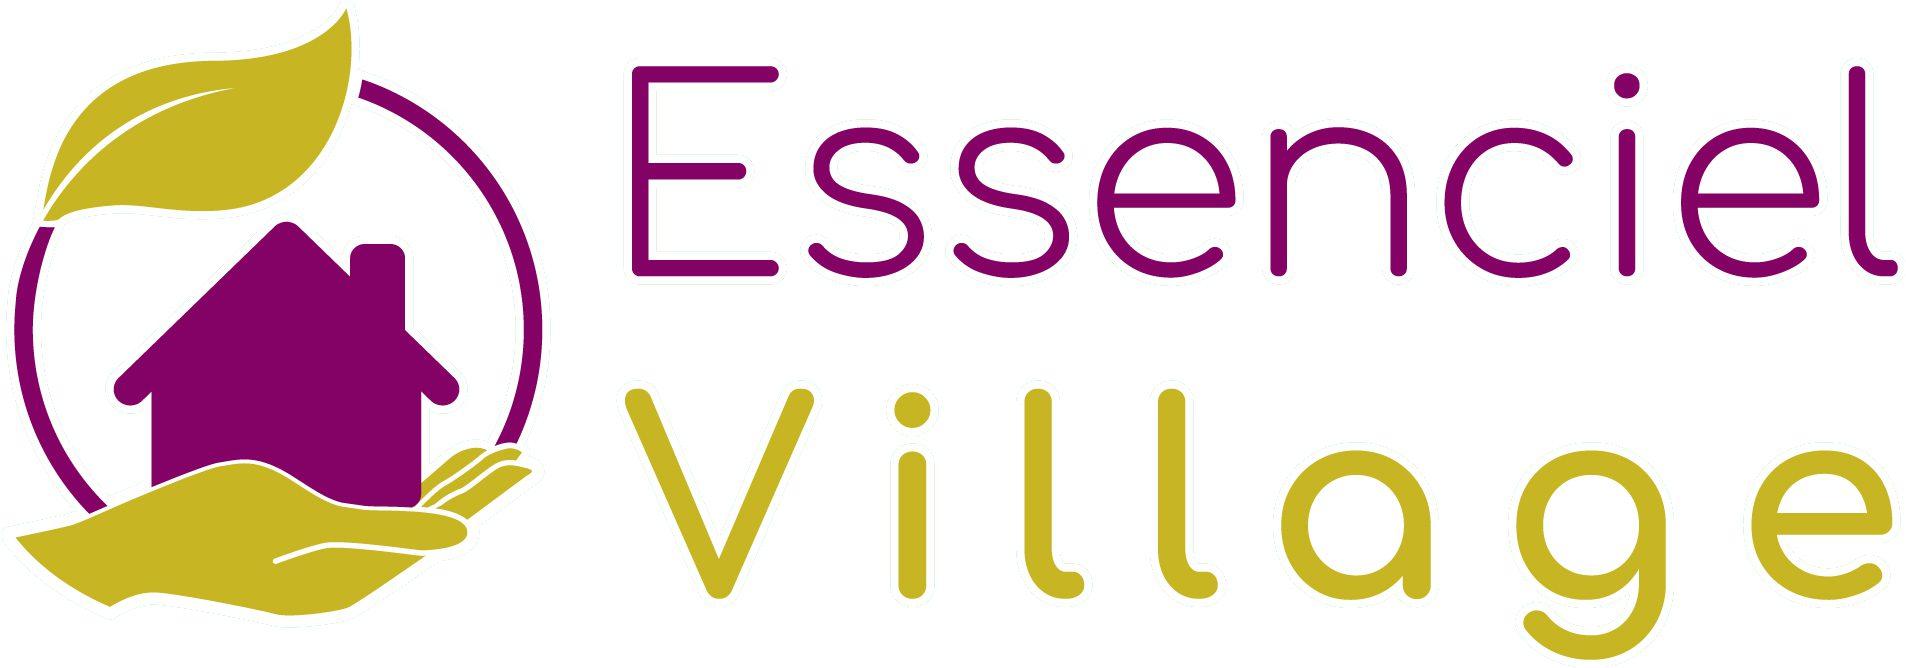 Mon projet de vie : Essenciel Village